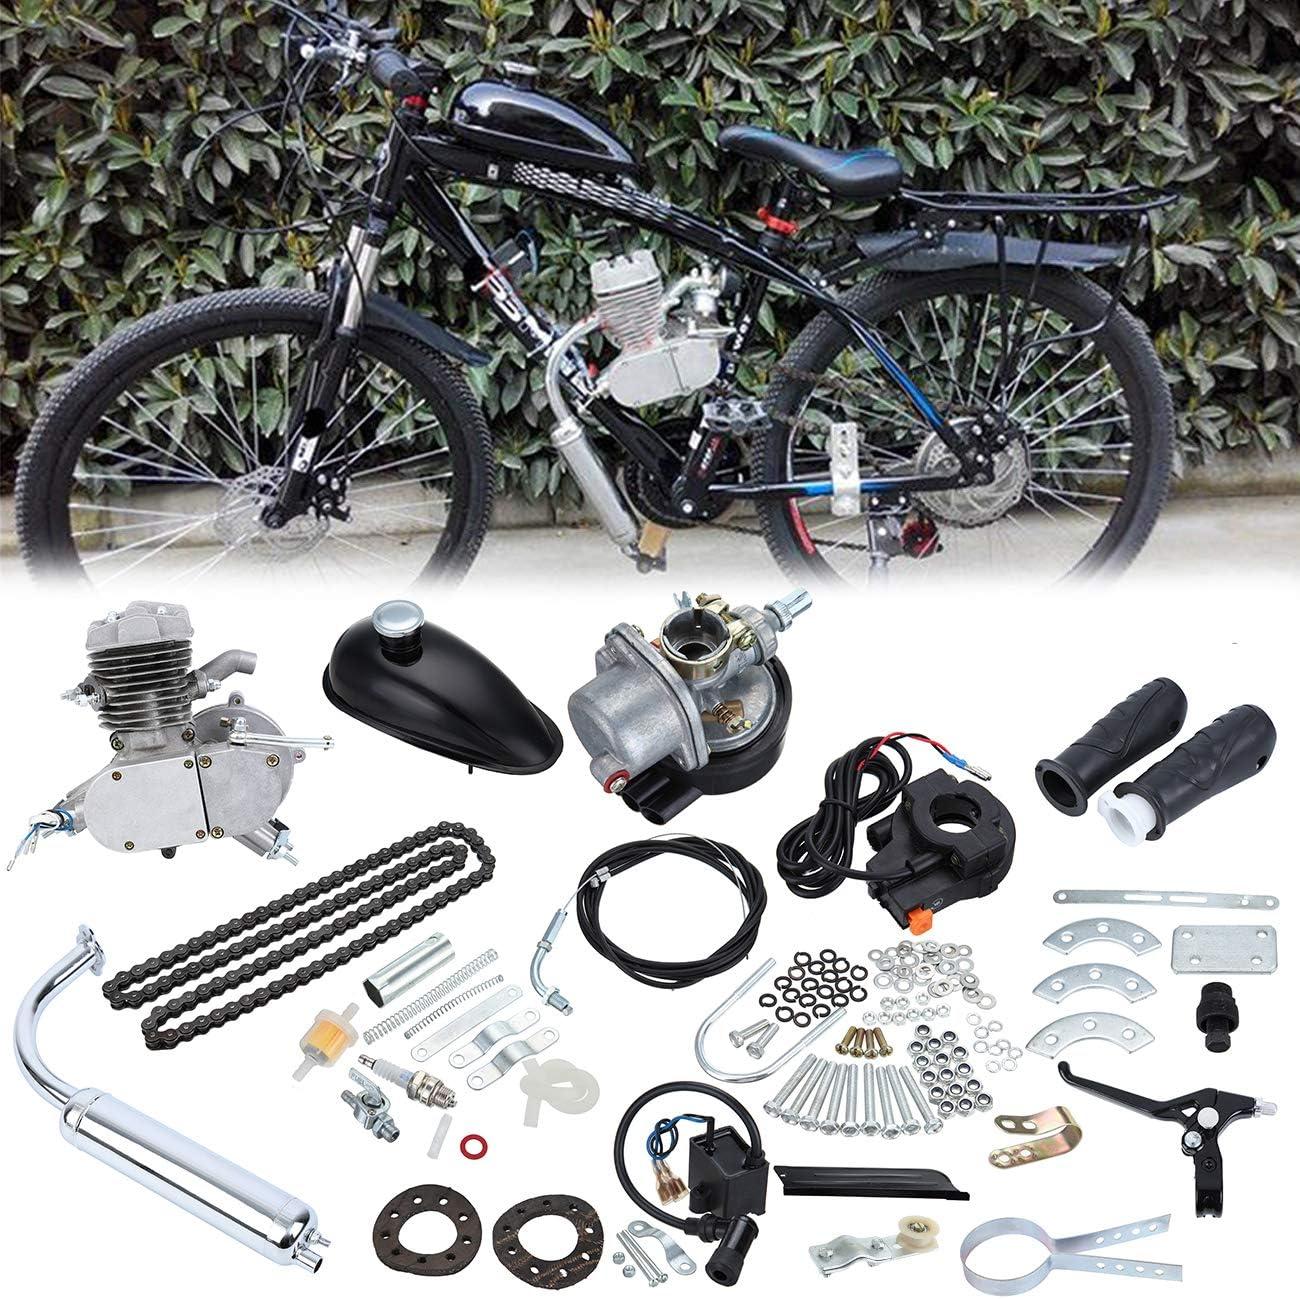 Samger Samger 2 tiempos Kit Motor de Bicicleta Gas Motor Kit de ...